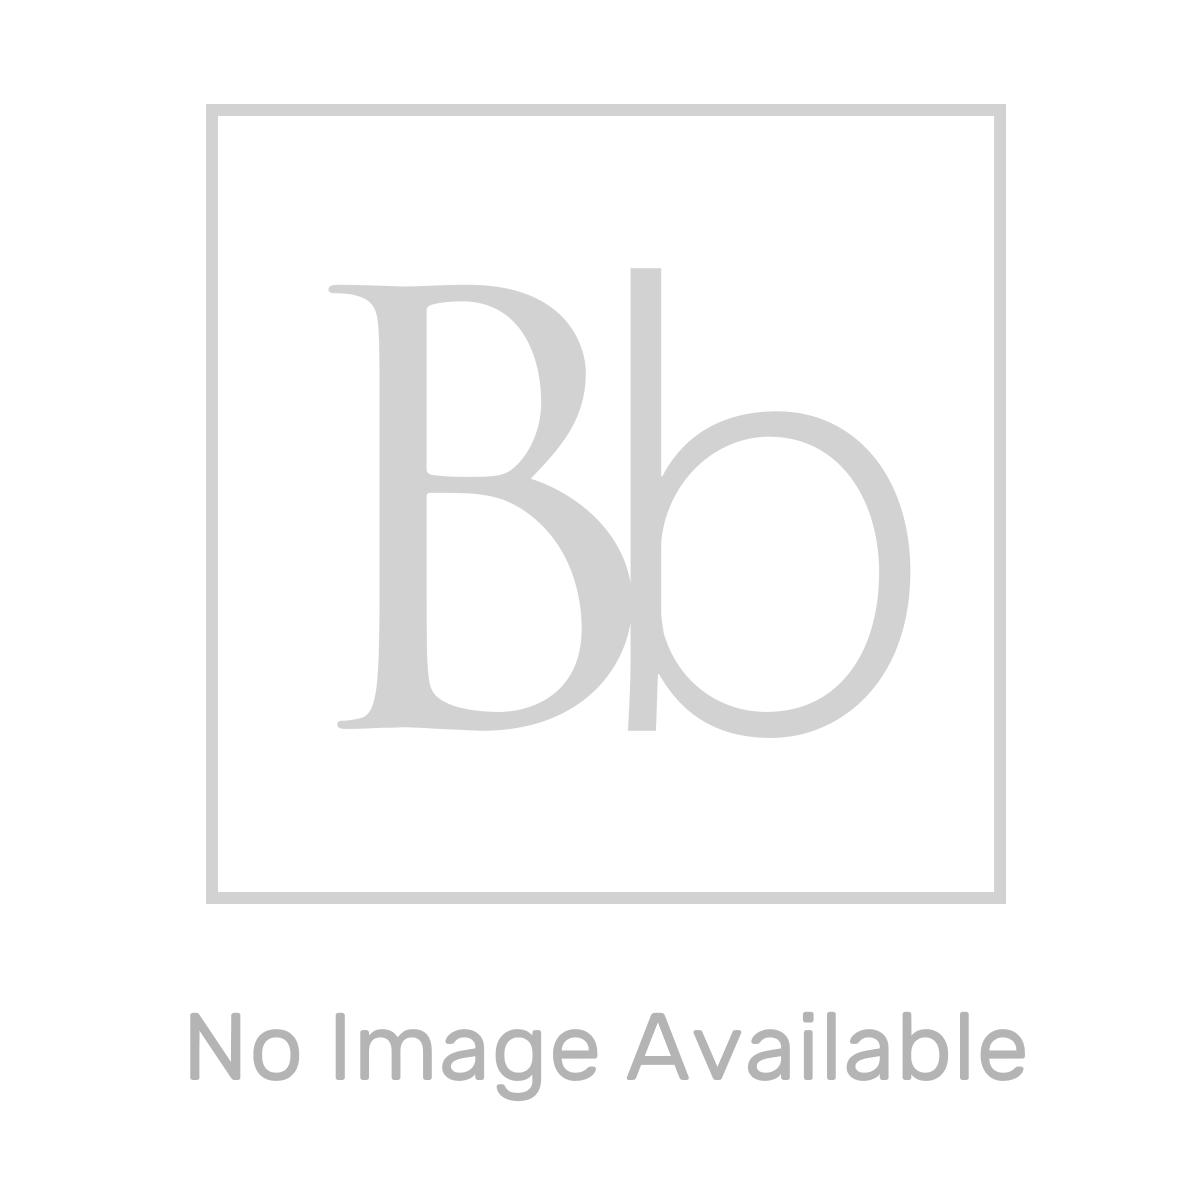 Richmond & Carlton Timeless Sand Soft Close Toilet Seat Dimensions